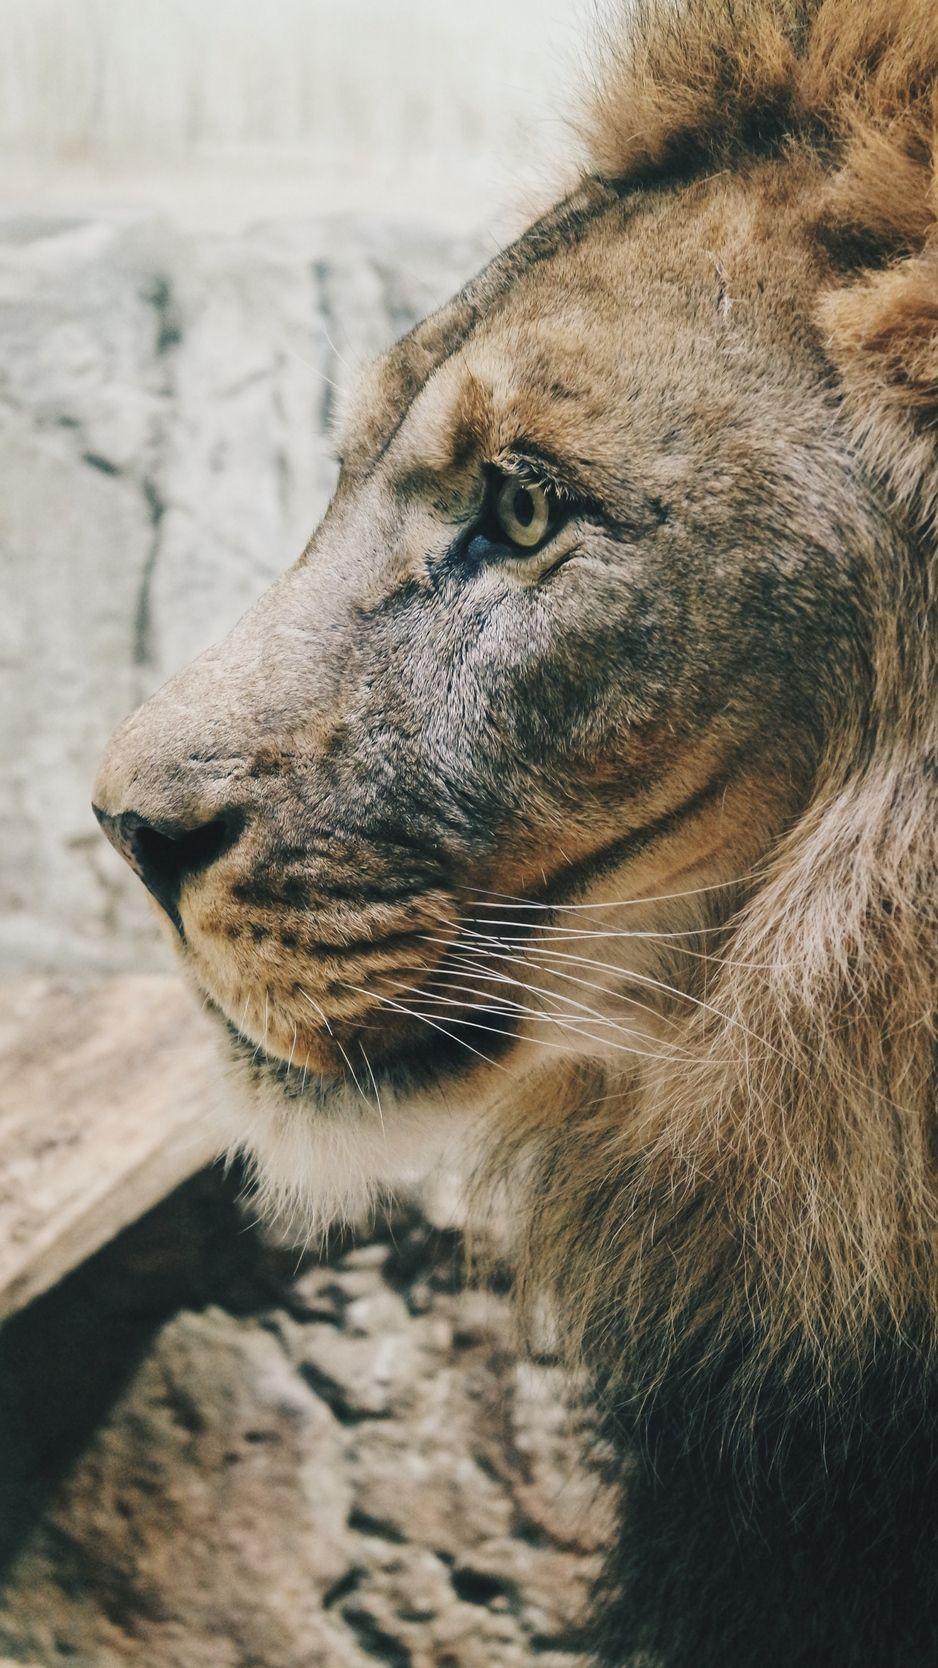 Lion Predator Profile Mane Sight King Of Beasts Wallpaper Beast Wallpaper Animals Lion Wallpaper